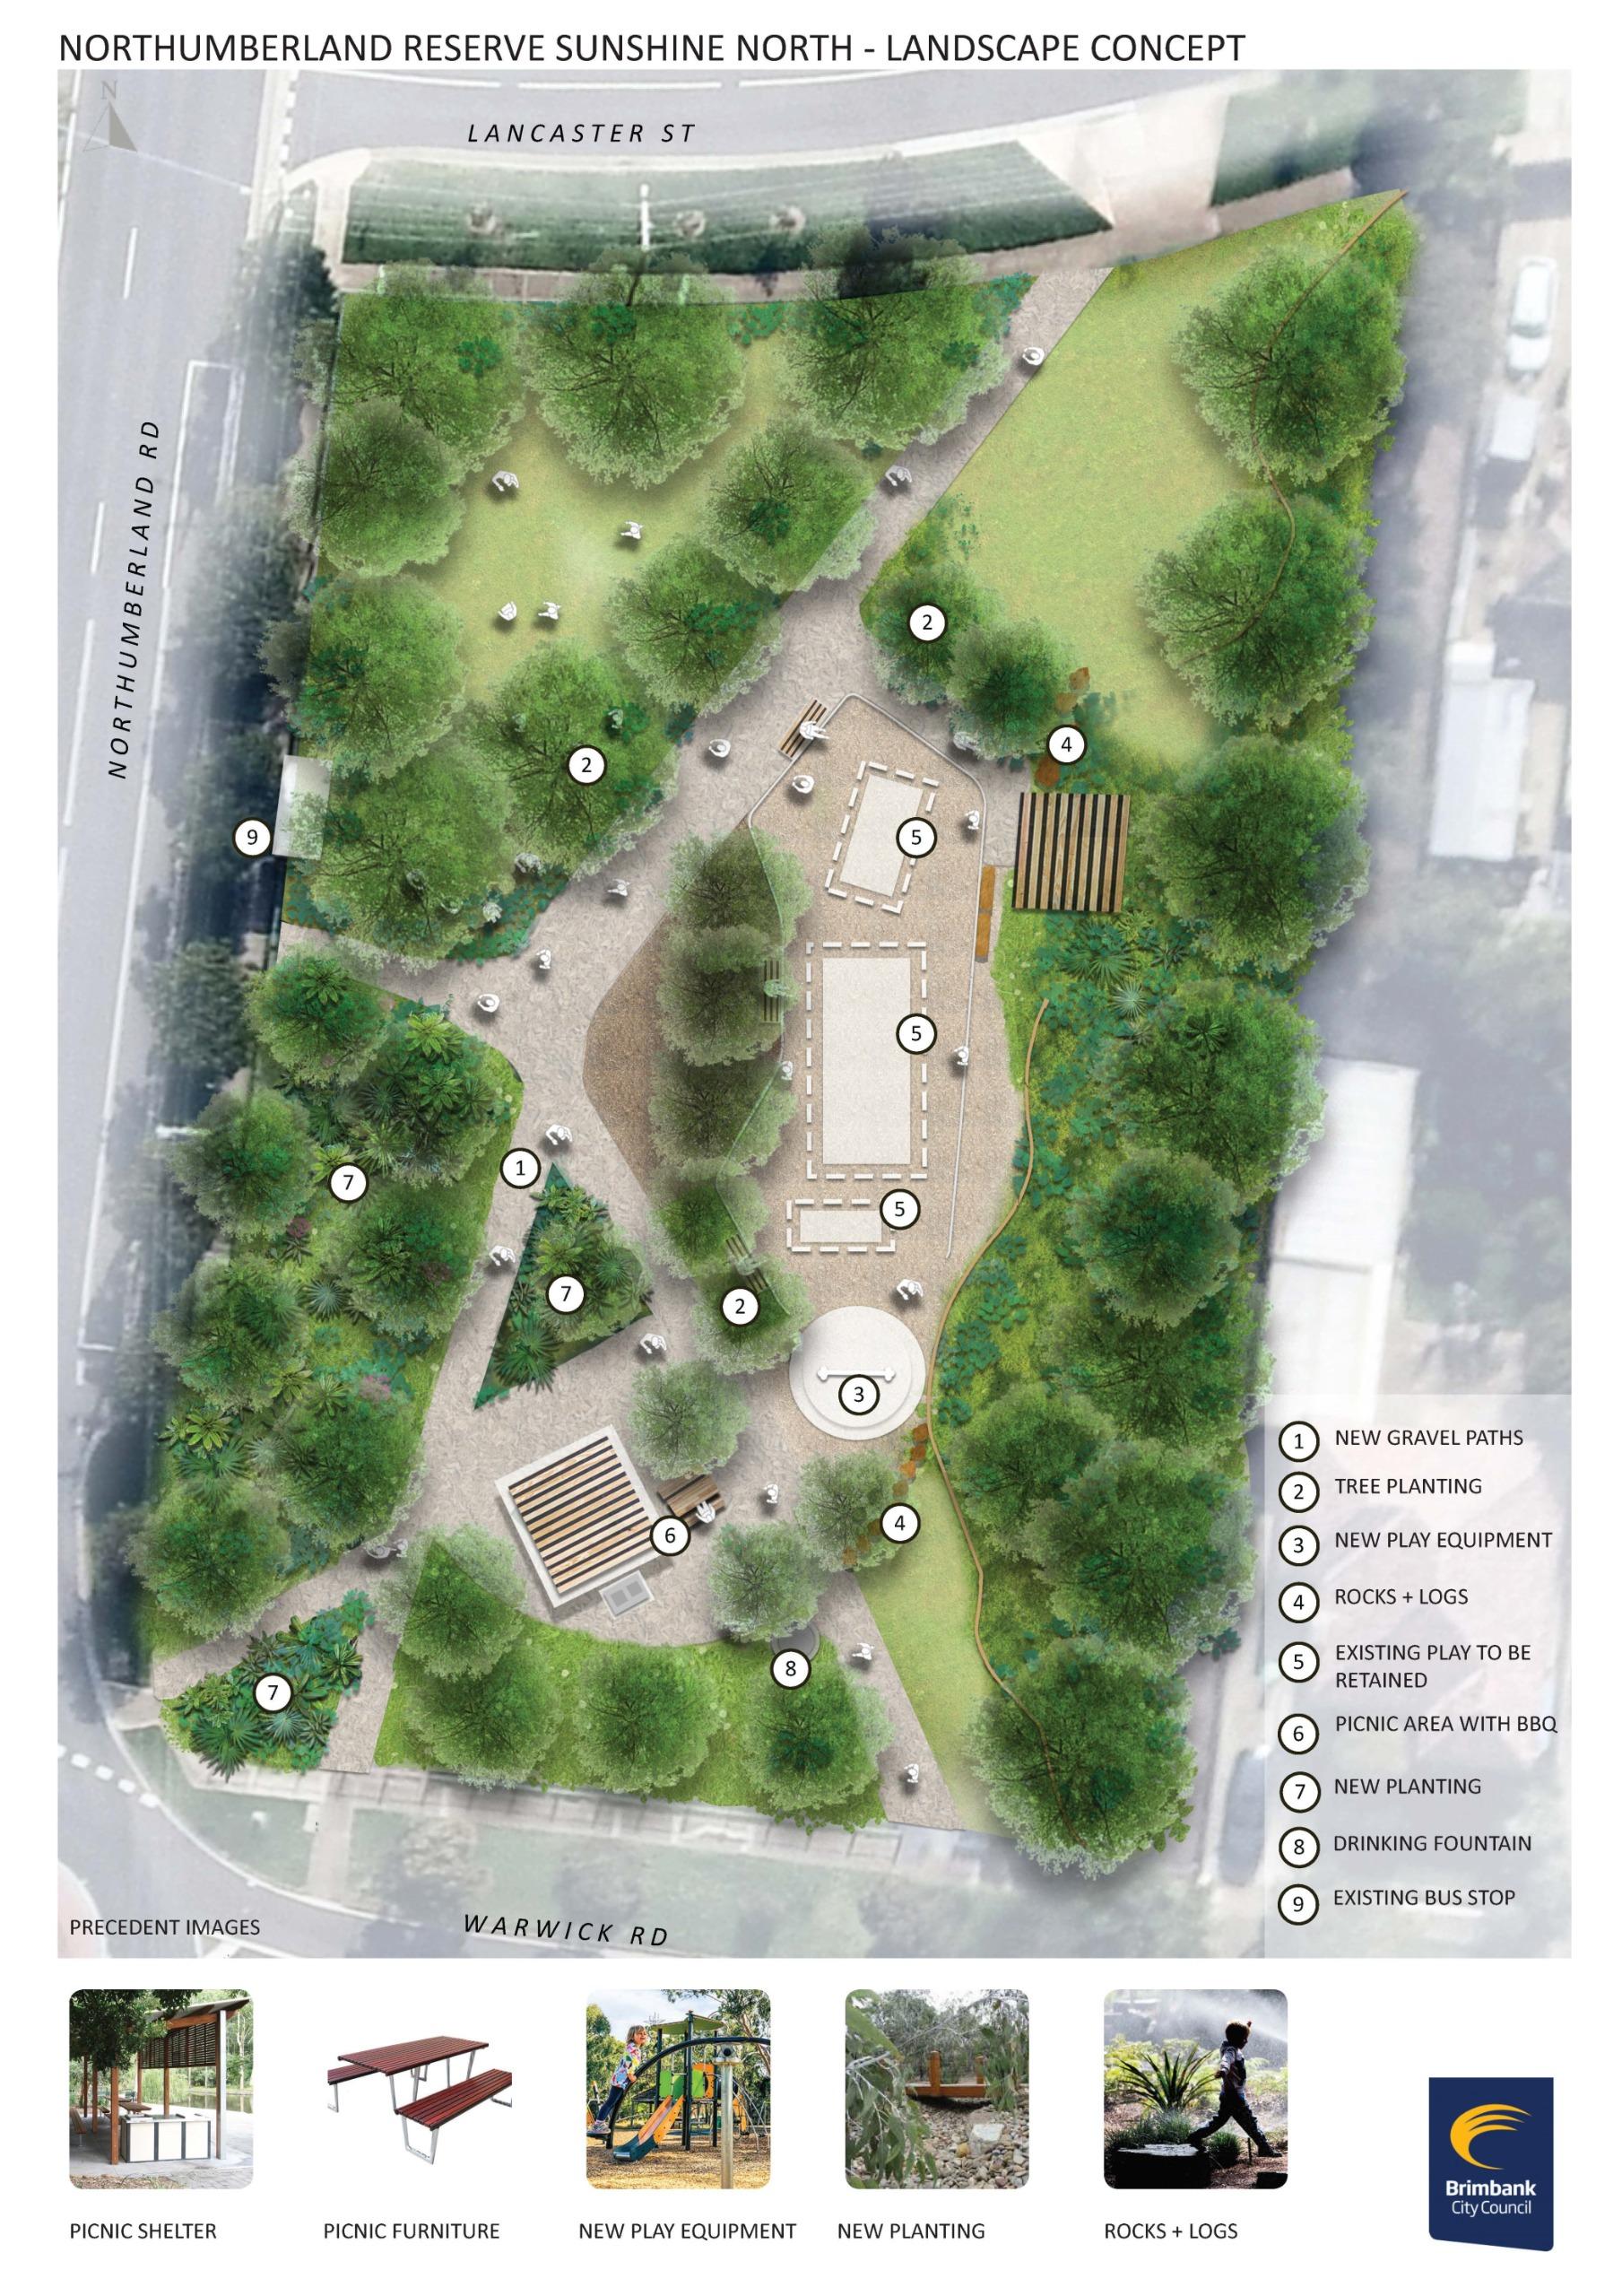 Northumberland Reserve Sunshine North - Landscape Concept Plan